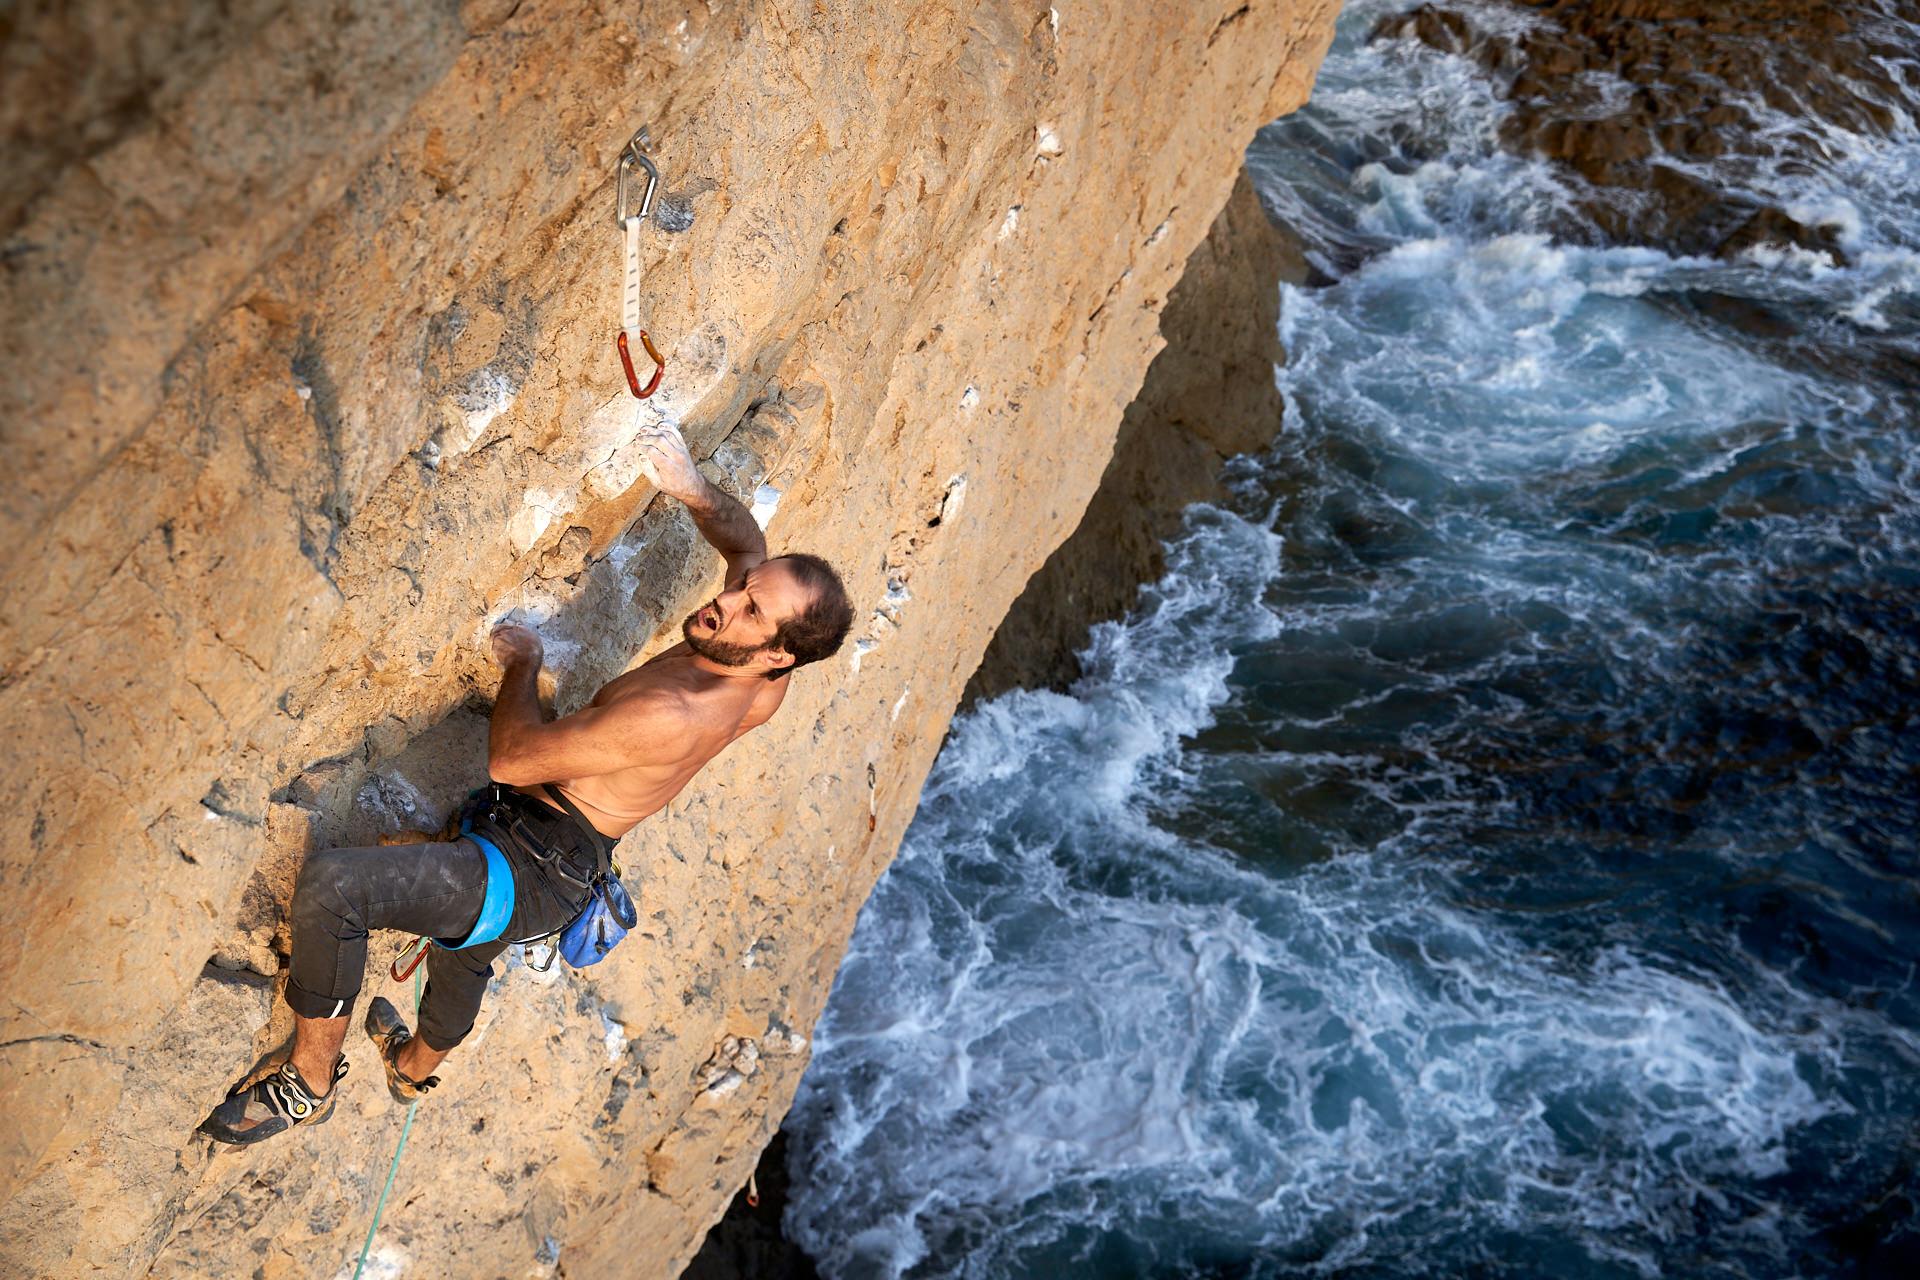 Lisbon Climbing Guide - Hugo Castro Silva climbing Caldo Verde (7b) in Atlântida ©Martim Vidigal